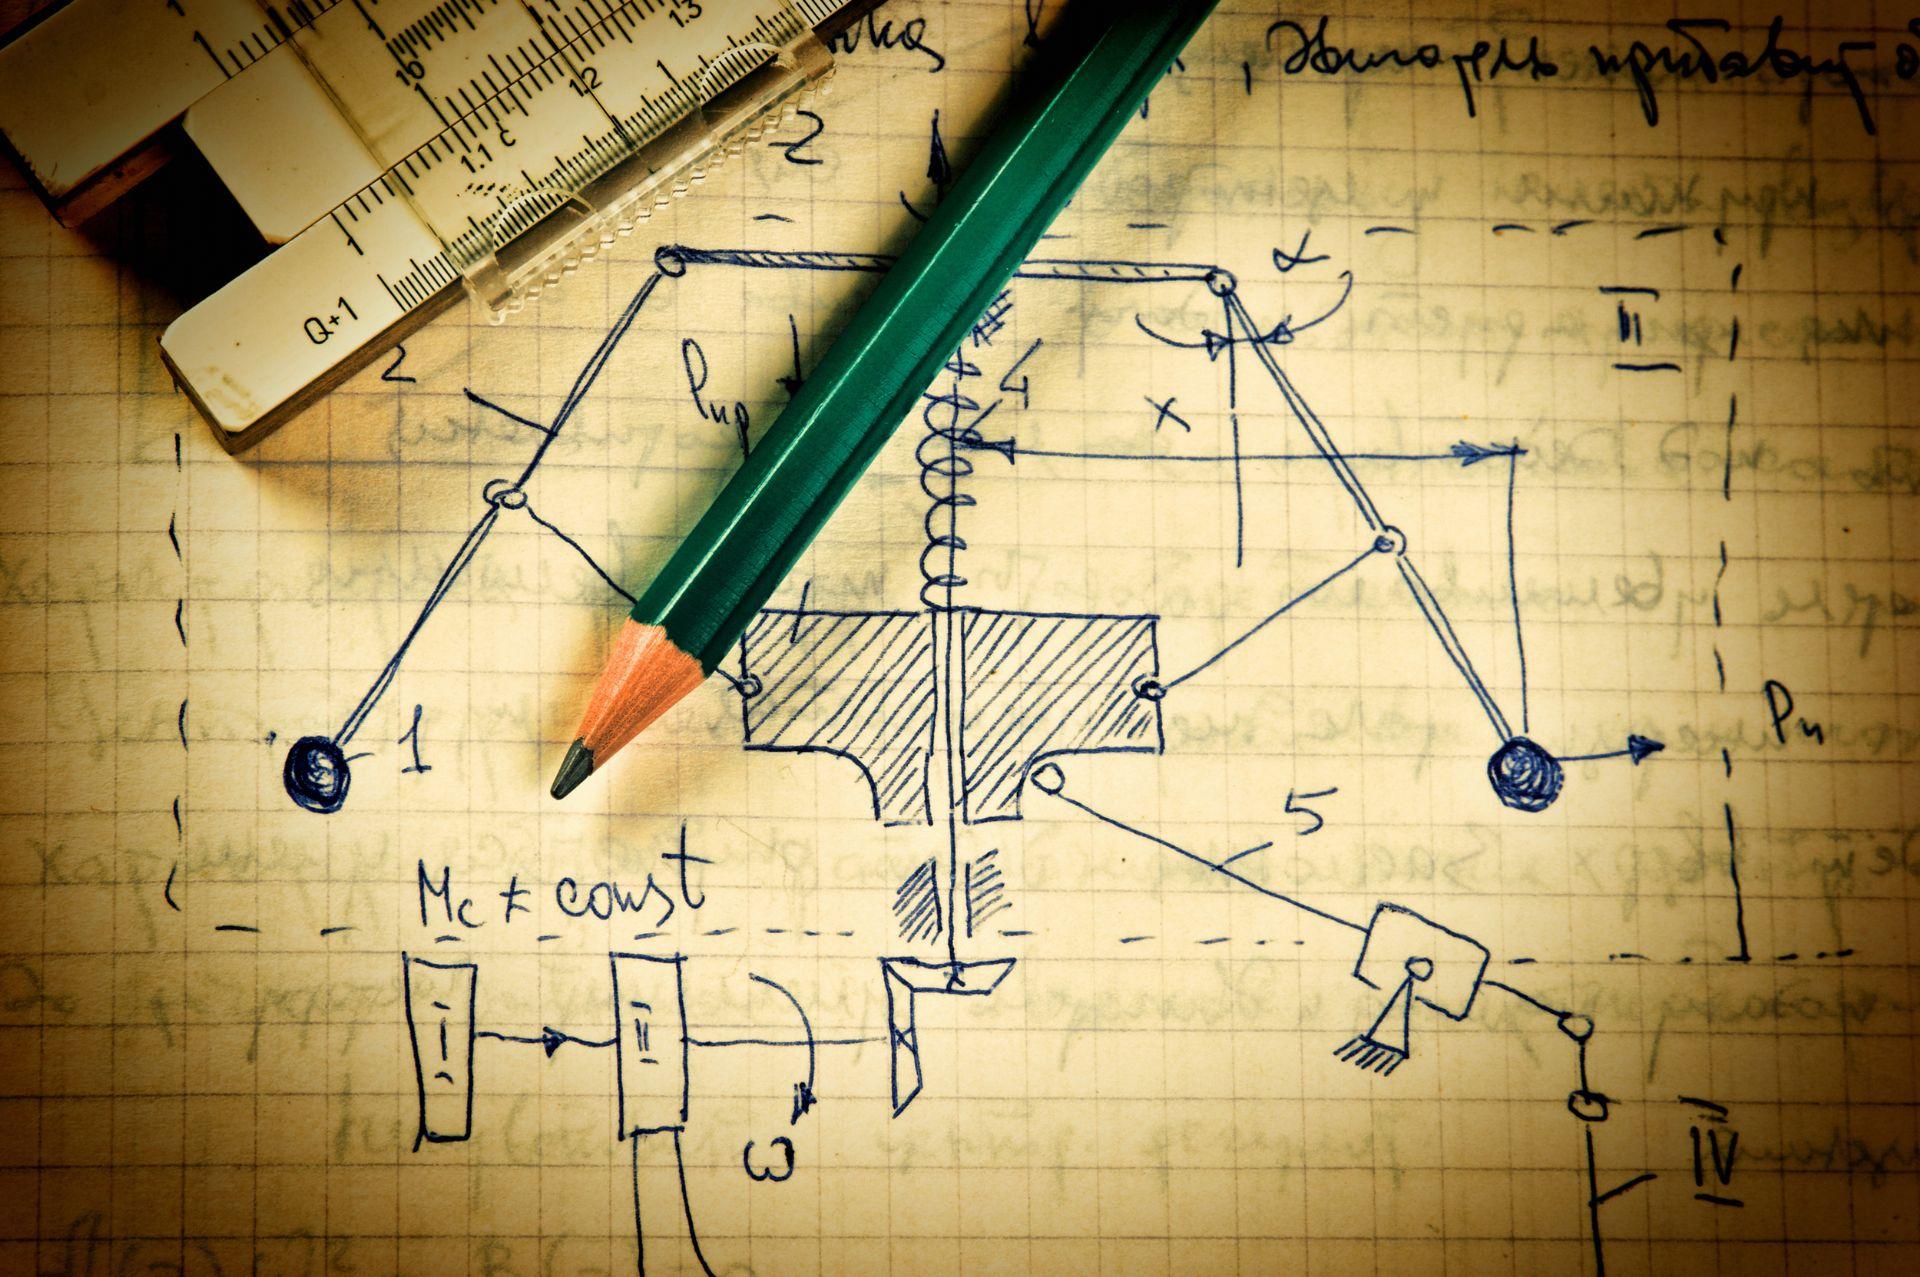 אדיסון עורכי פטנטים | עריכה ורישום פטנטים